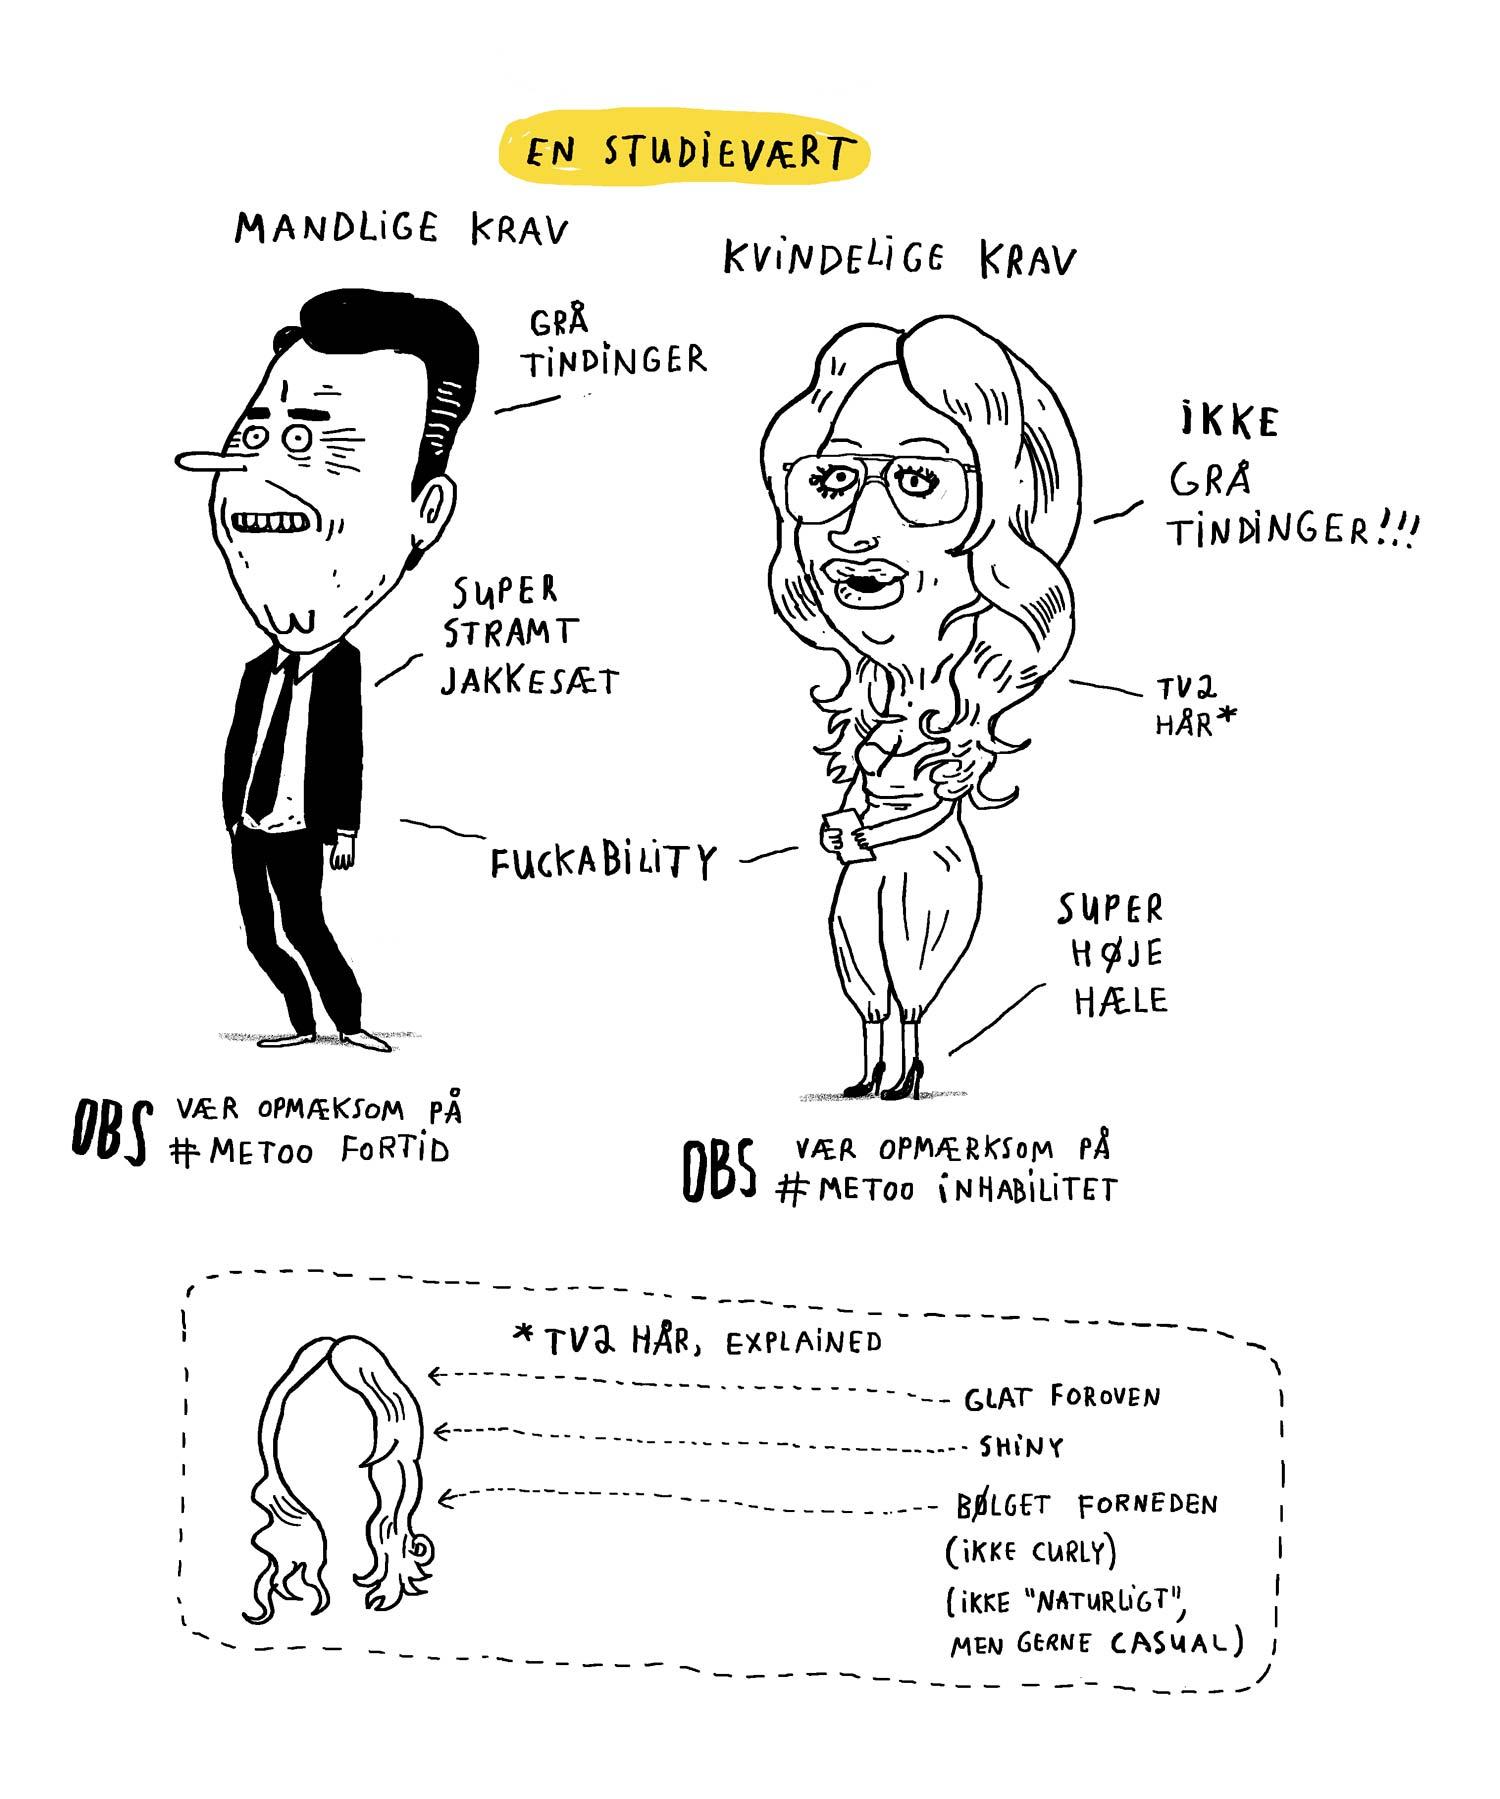 Sådan dækker du en coronakrise – ifølge Philip Ytournel 1